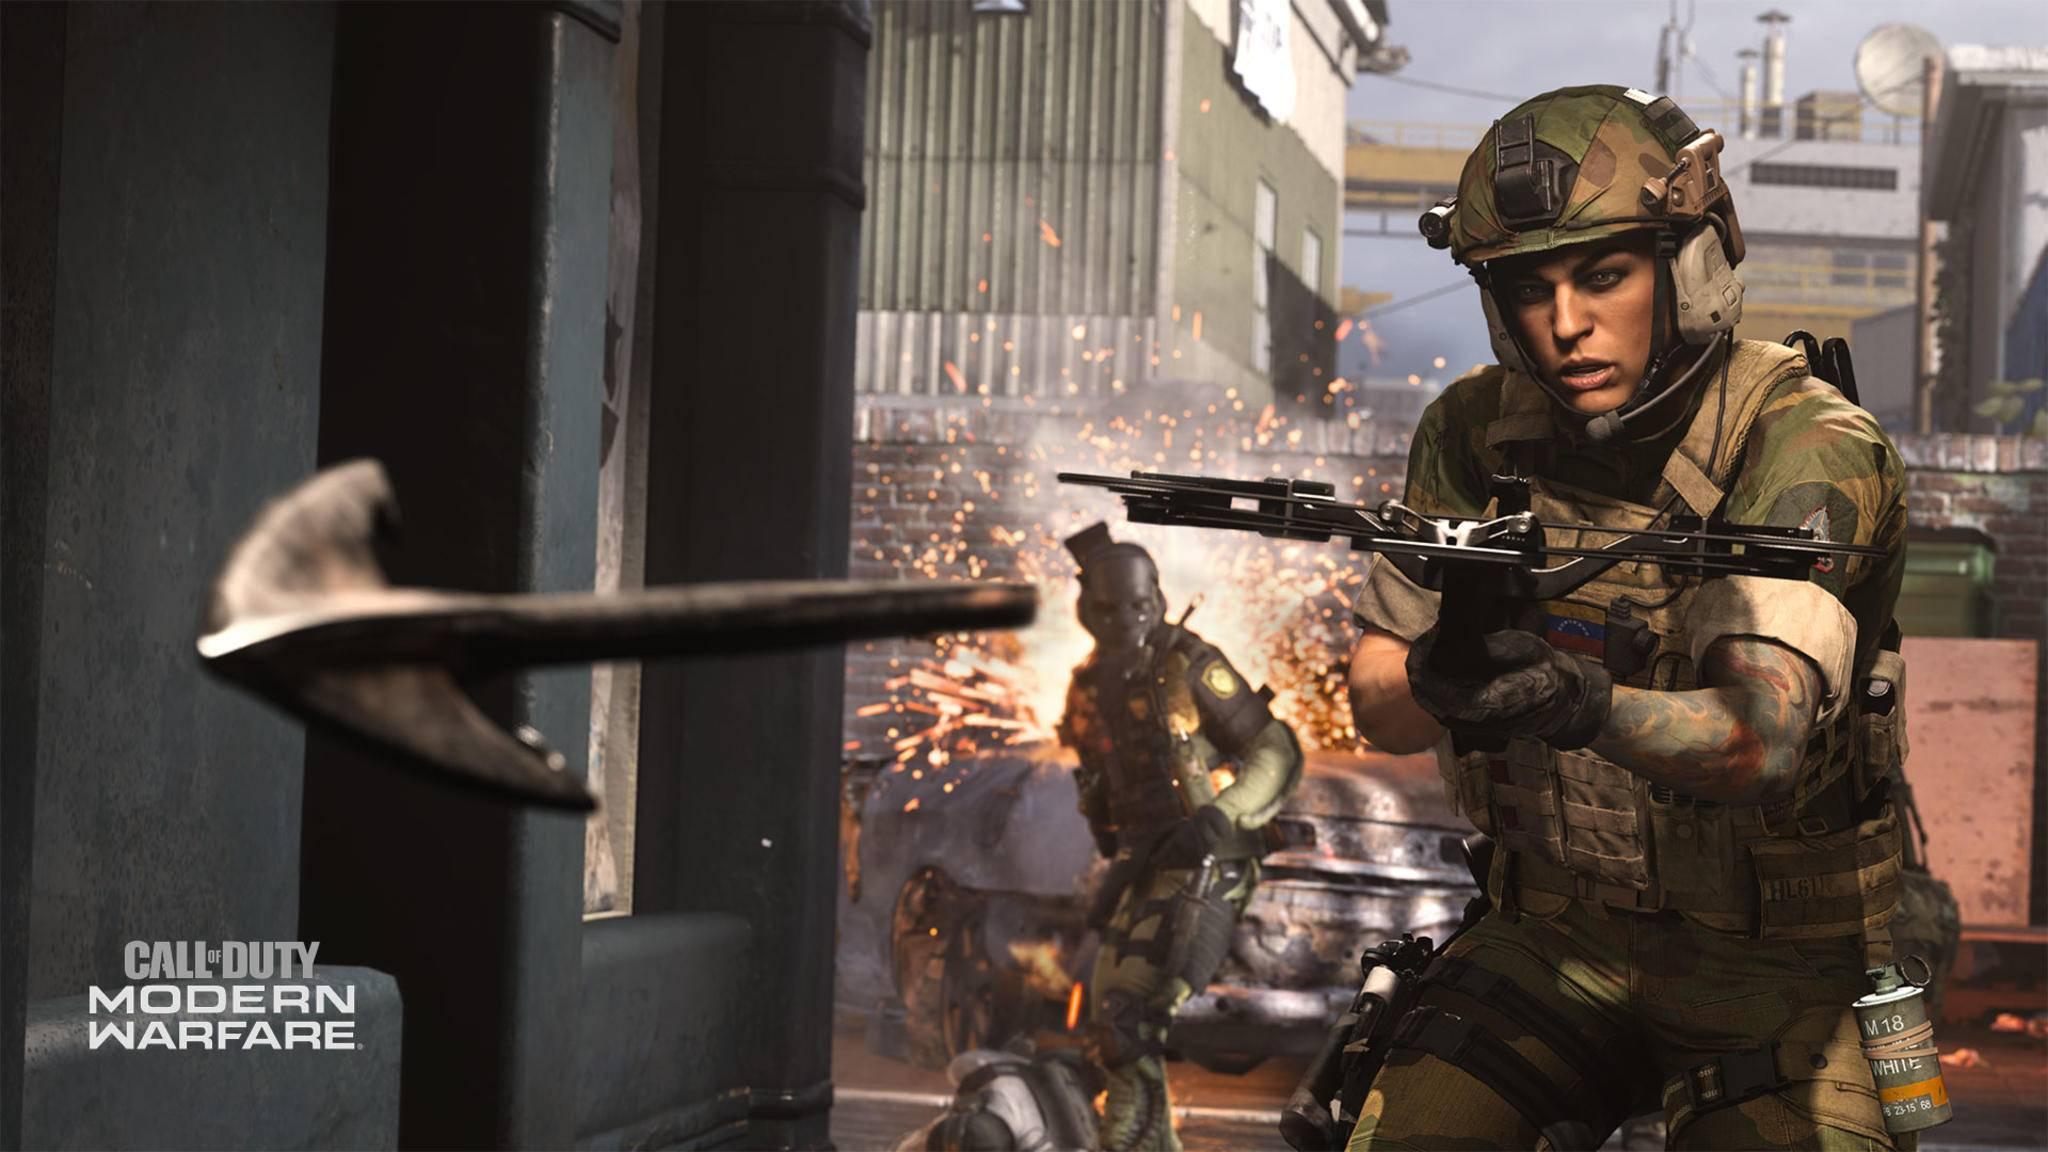 call-of-duty-modern-warfare-armbrust